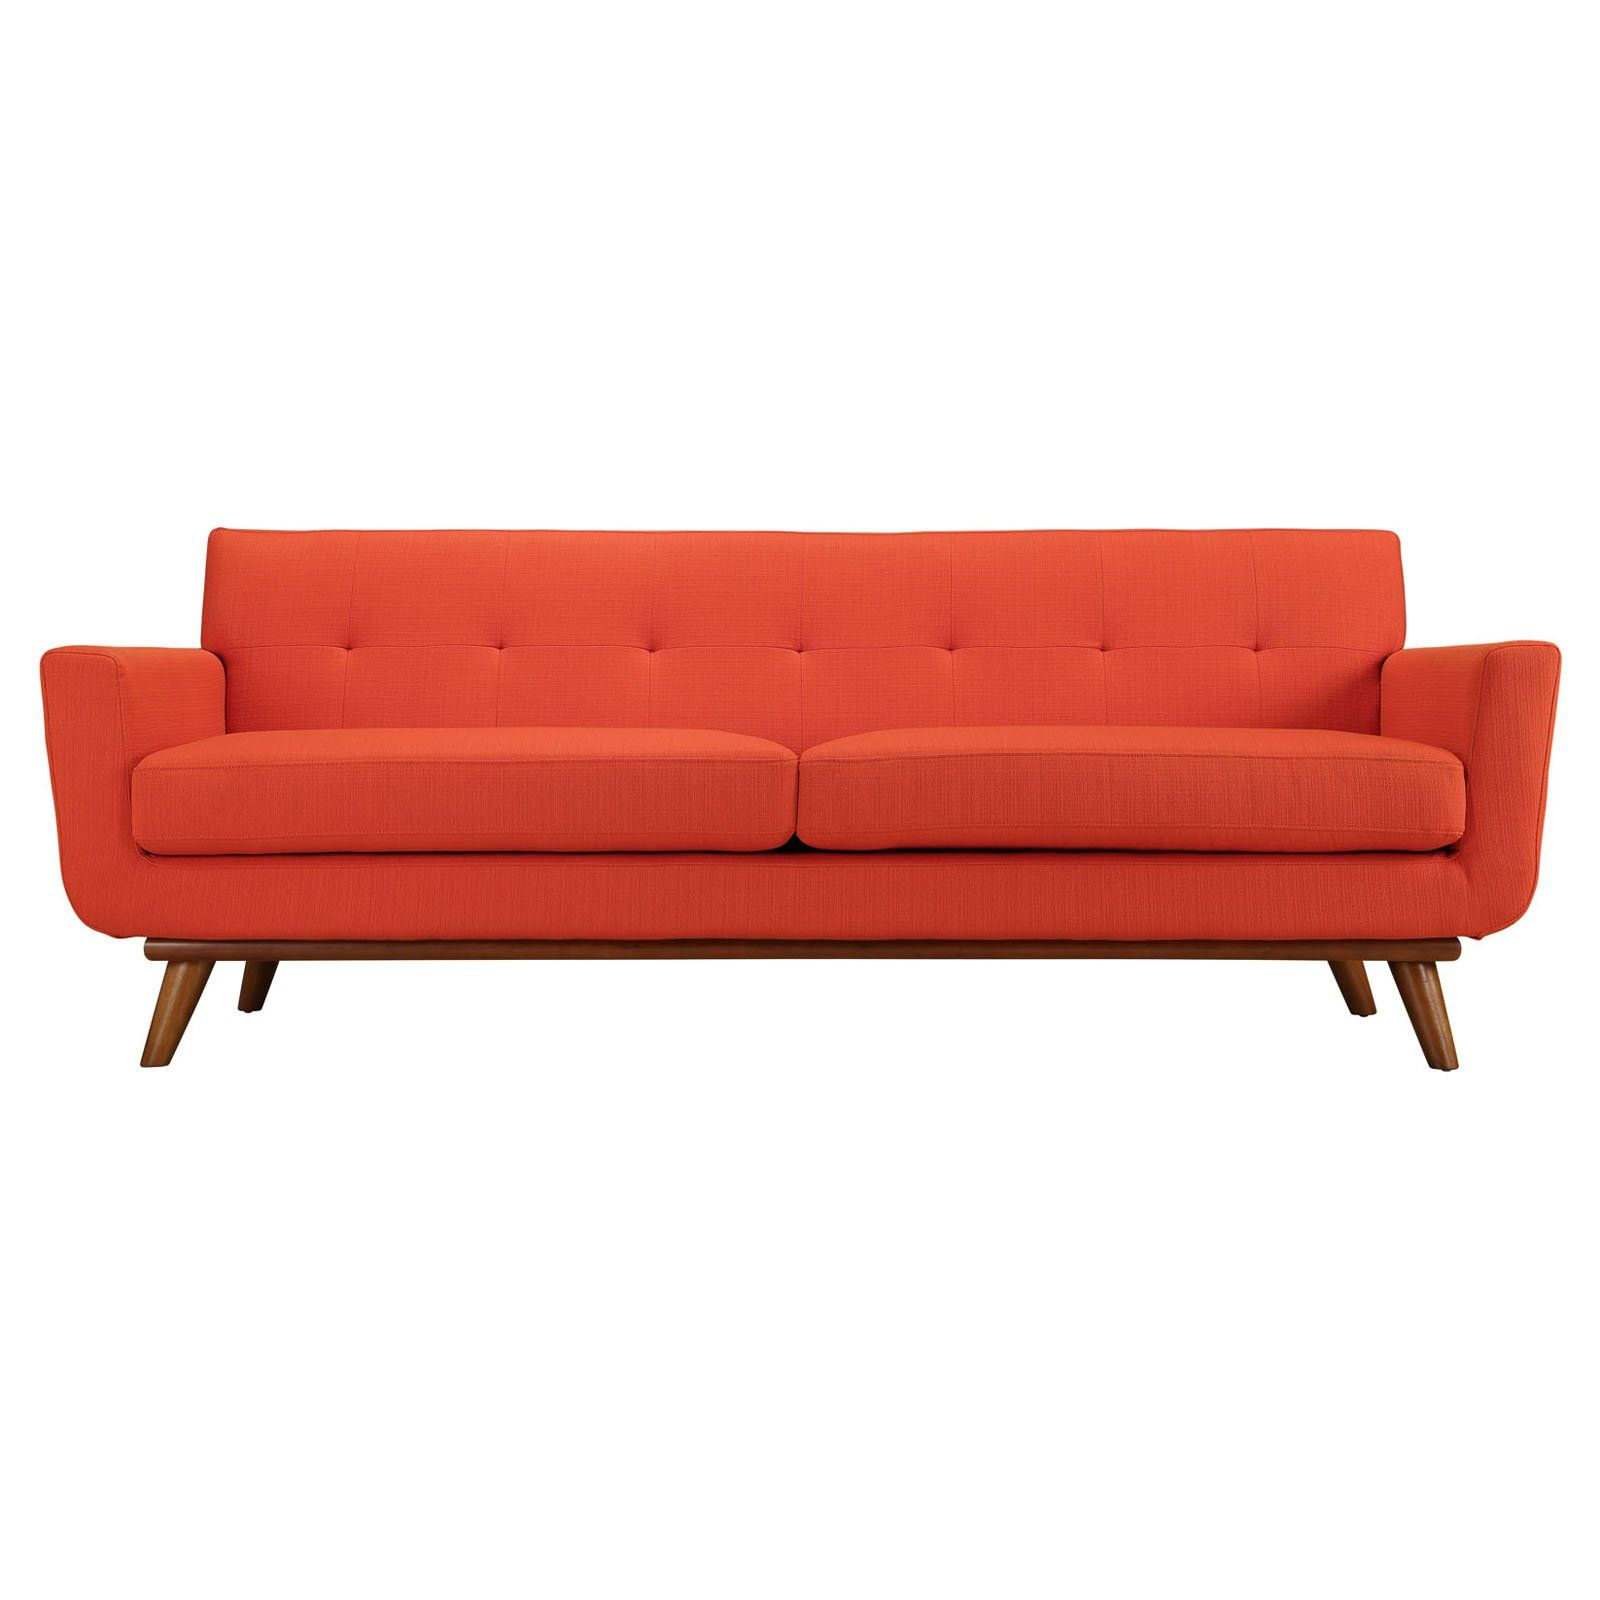 37c1d71378139b26b31ce85c0d60ed66 - Better Homes & Gardens Porter Fabric Tufted Futon Rust Orange